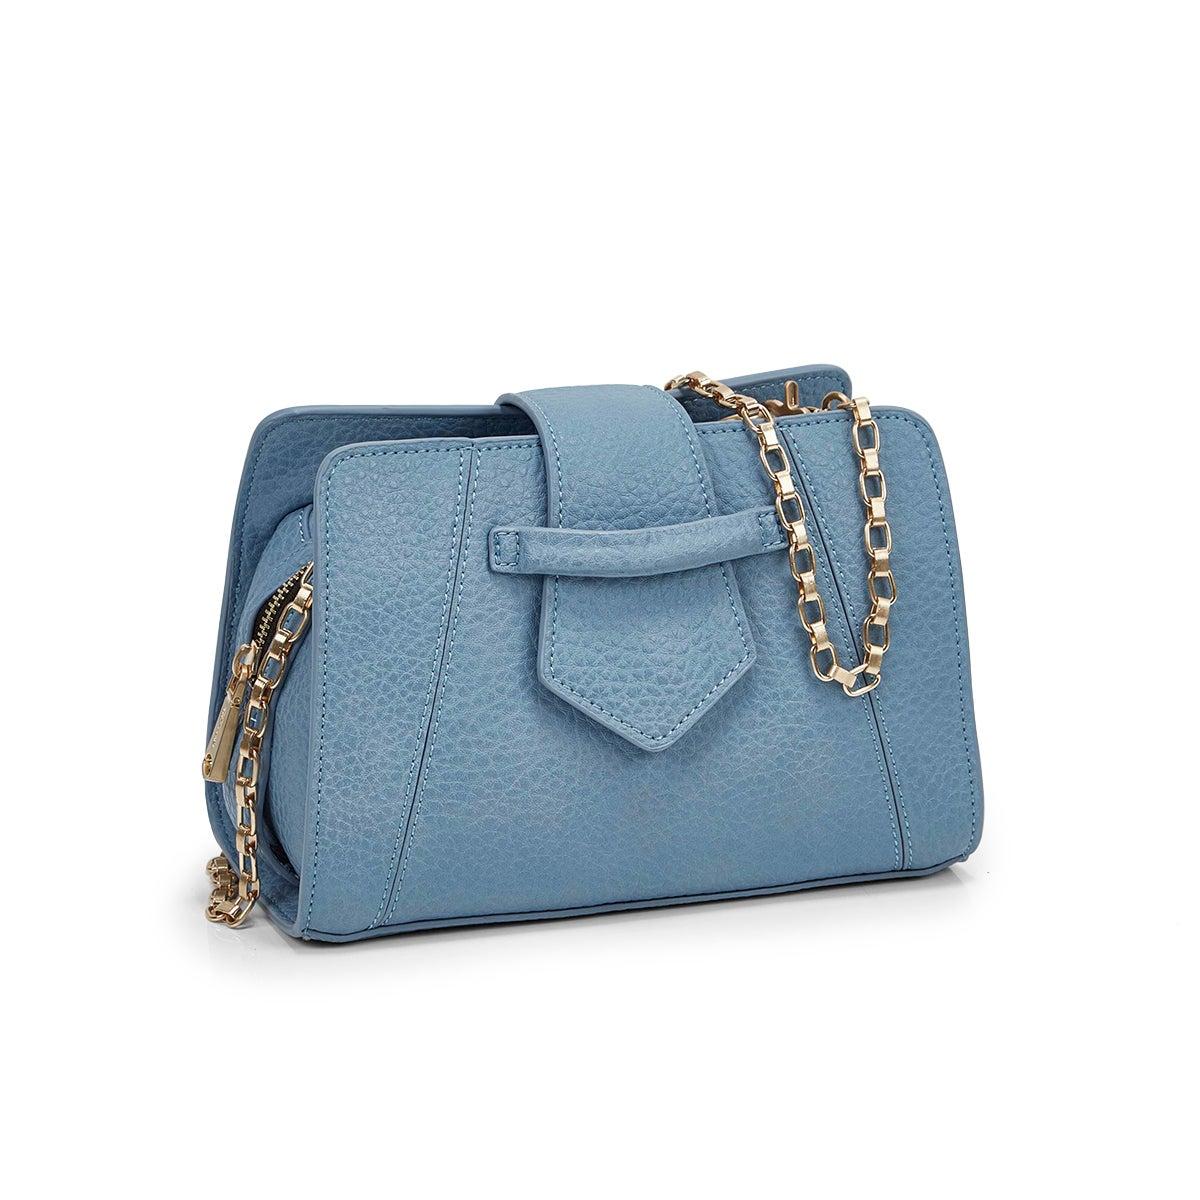 Women`s 5604 MINI SADDLE light blue cross body bag